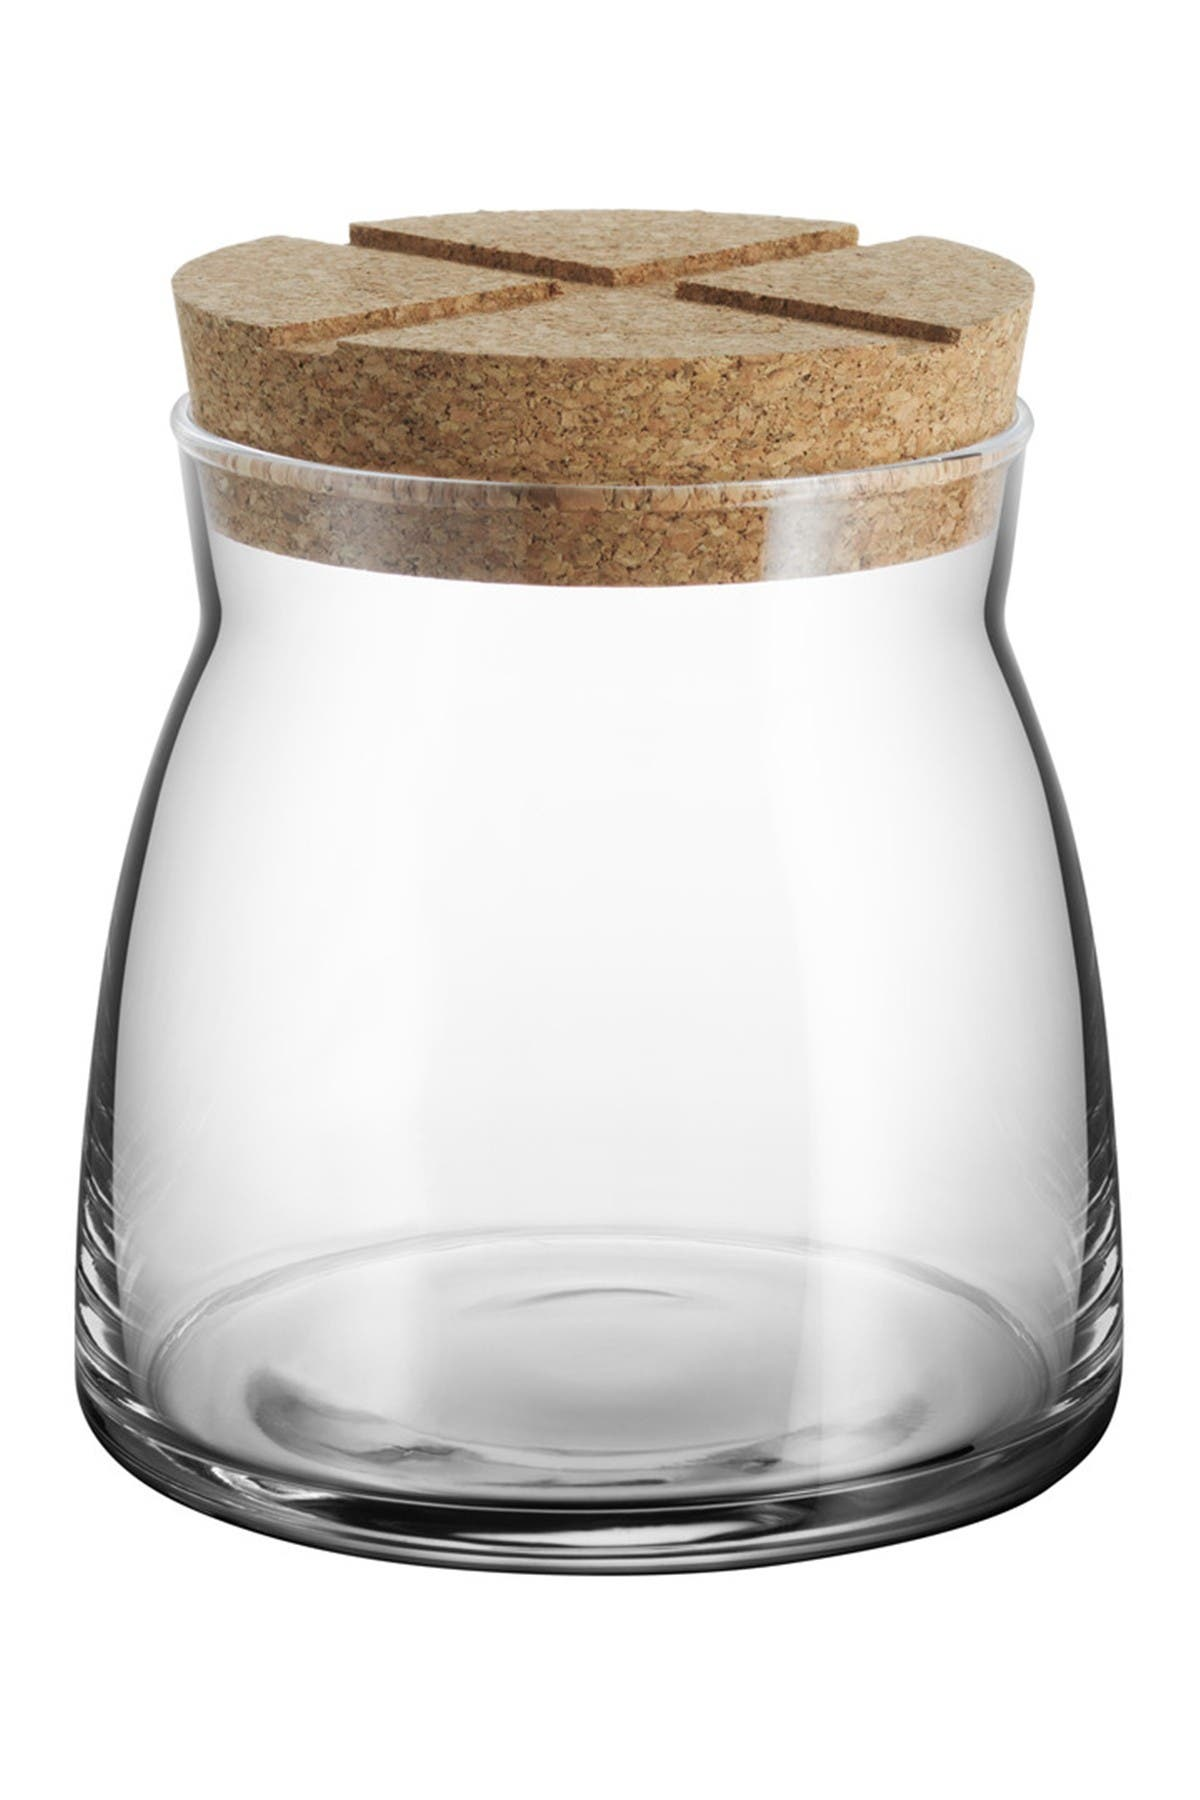 Image of Kosta Boda Bruk Storage Jar with Airtight Cork Lid - Clear